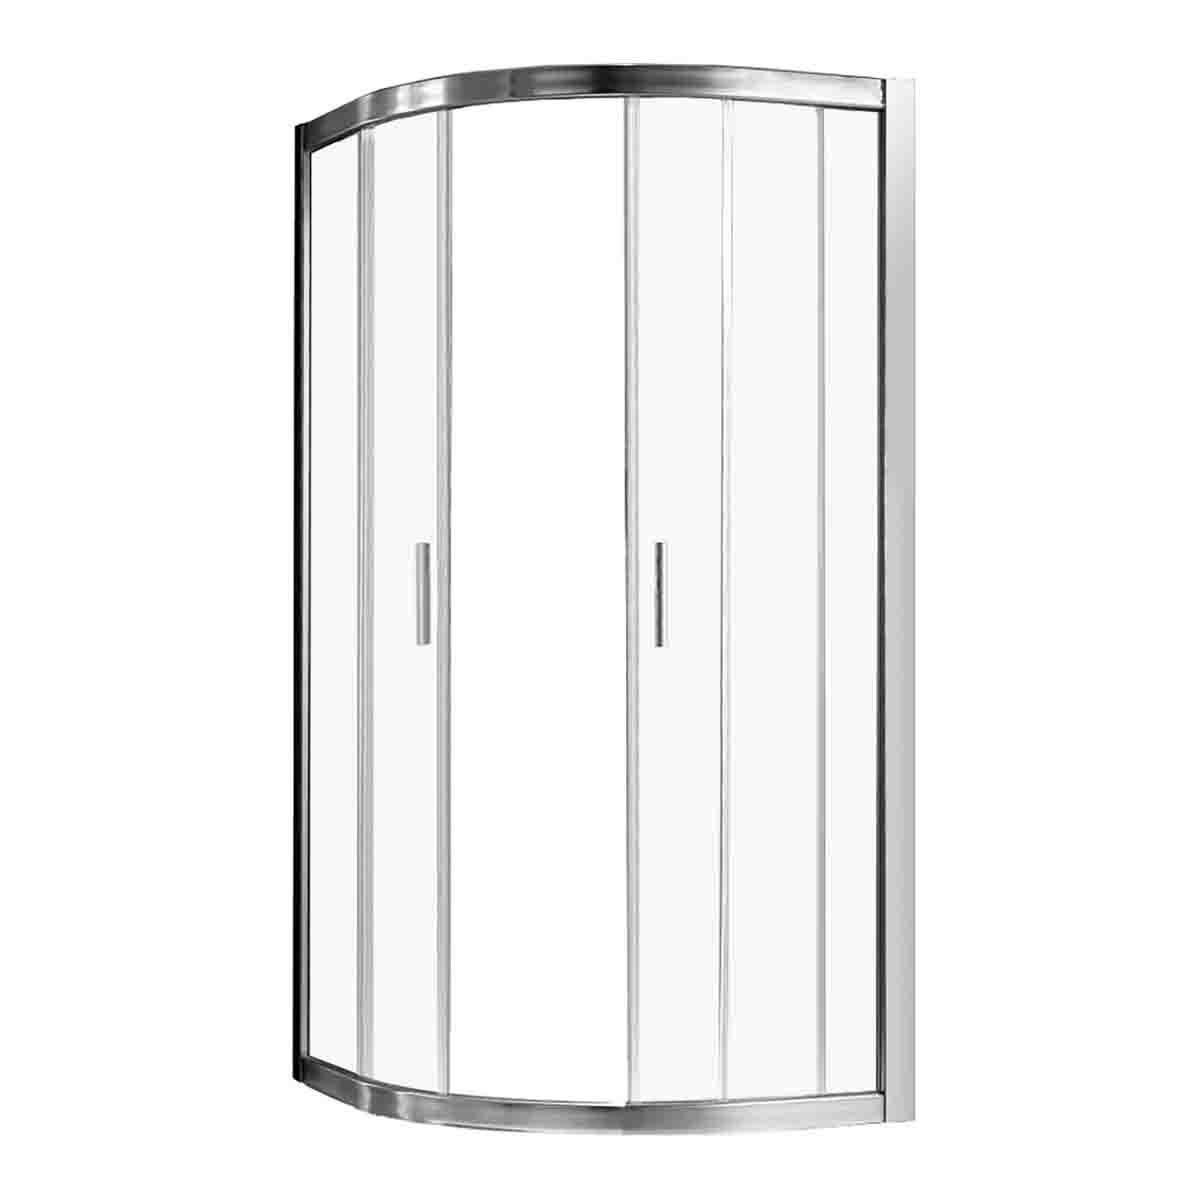 Box Doccia Alnair 1/4 Cerchio H190 Cm (68-72) X (87-91) Cm Vetro Temperato 6 Mm Trasparente